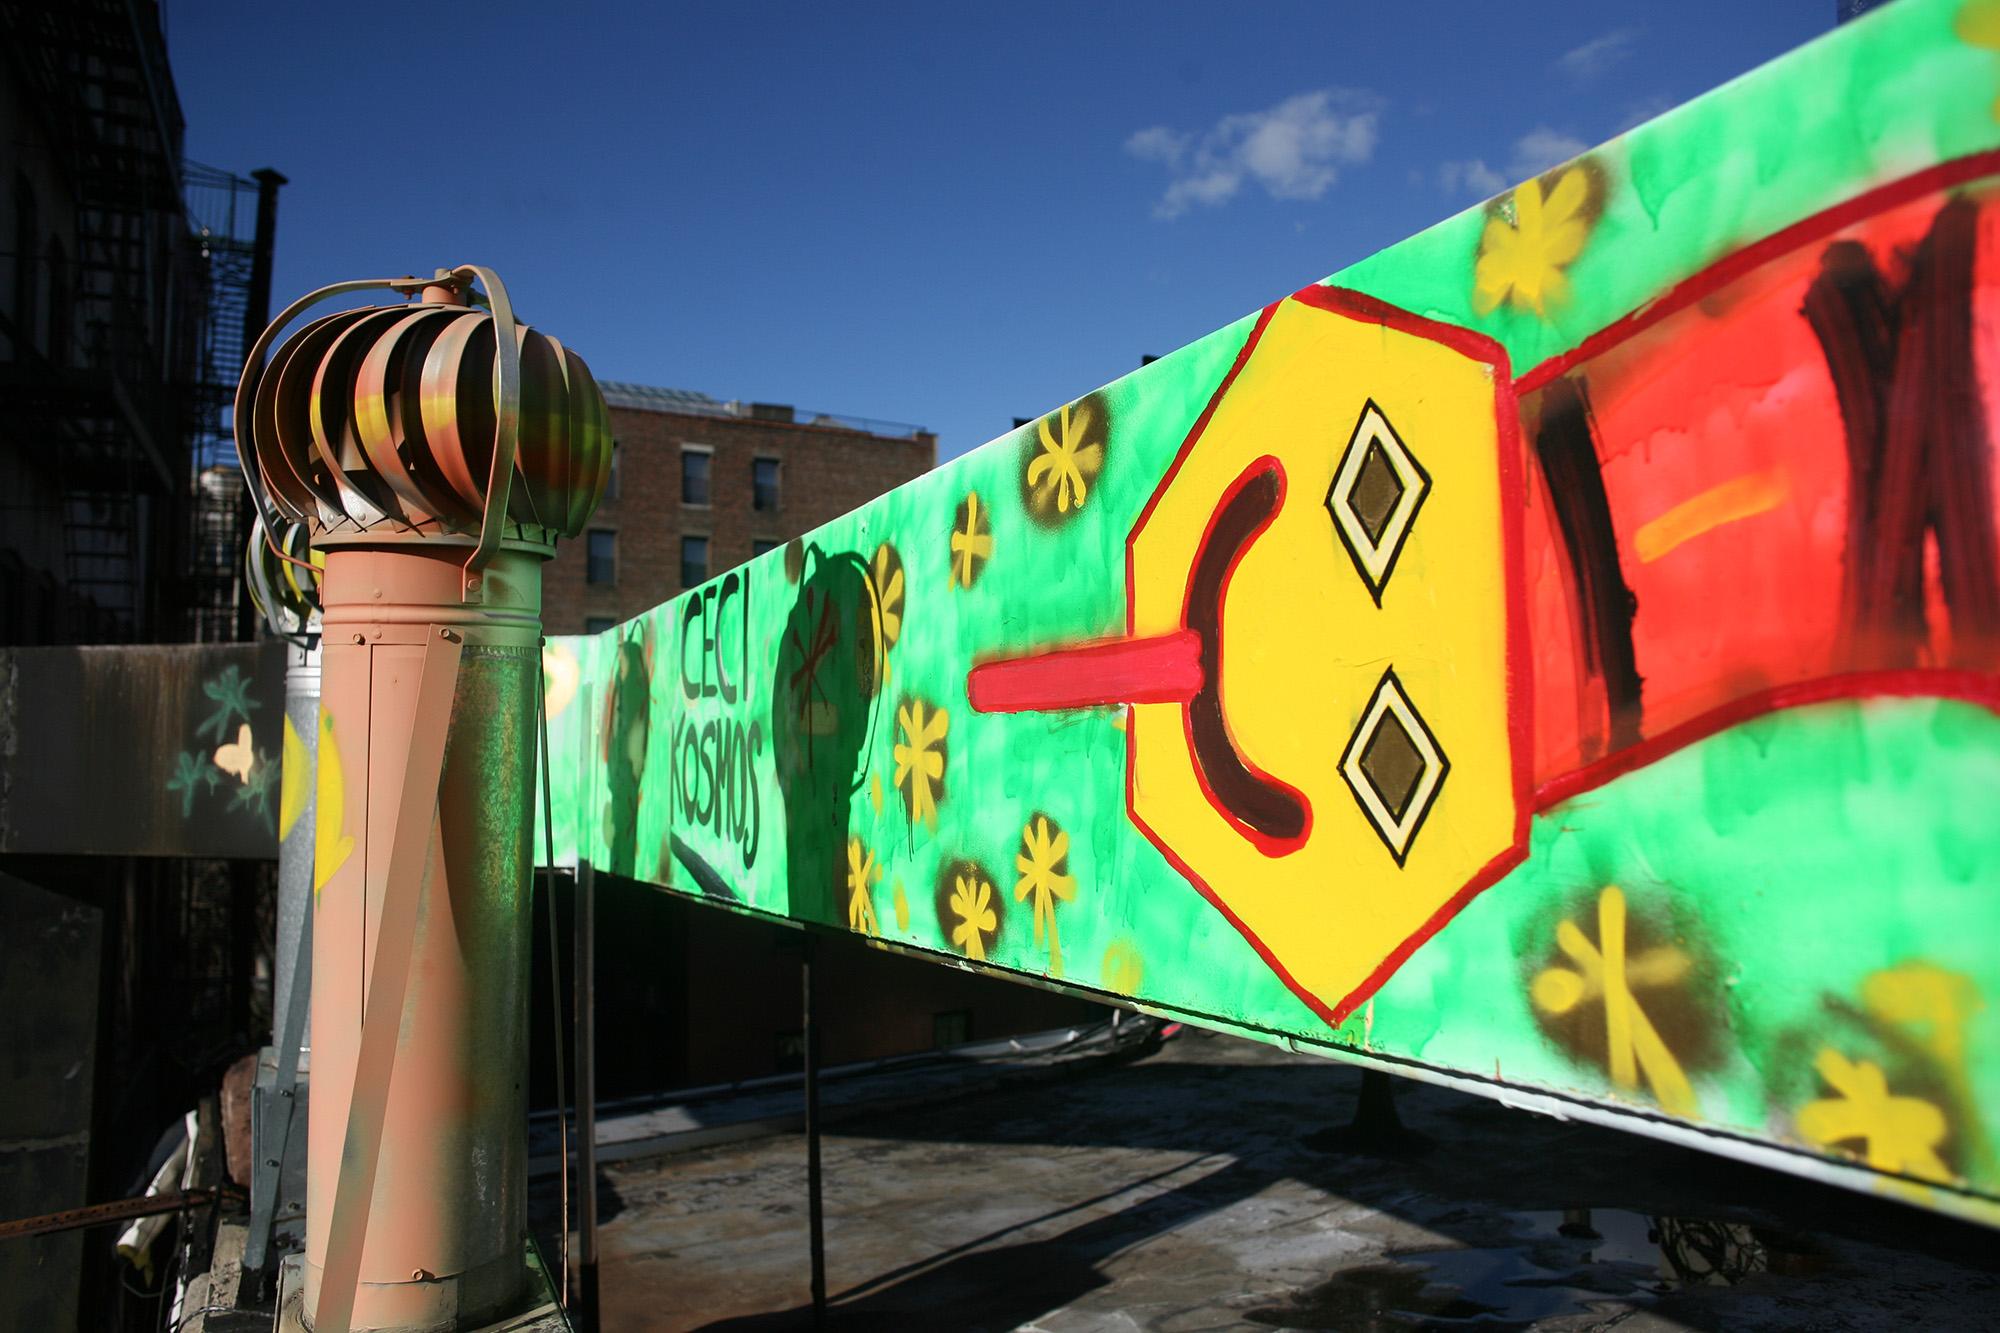 Cecilia-collantes-streetart-kulebra6.jpg